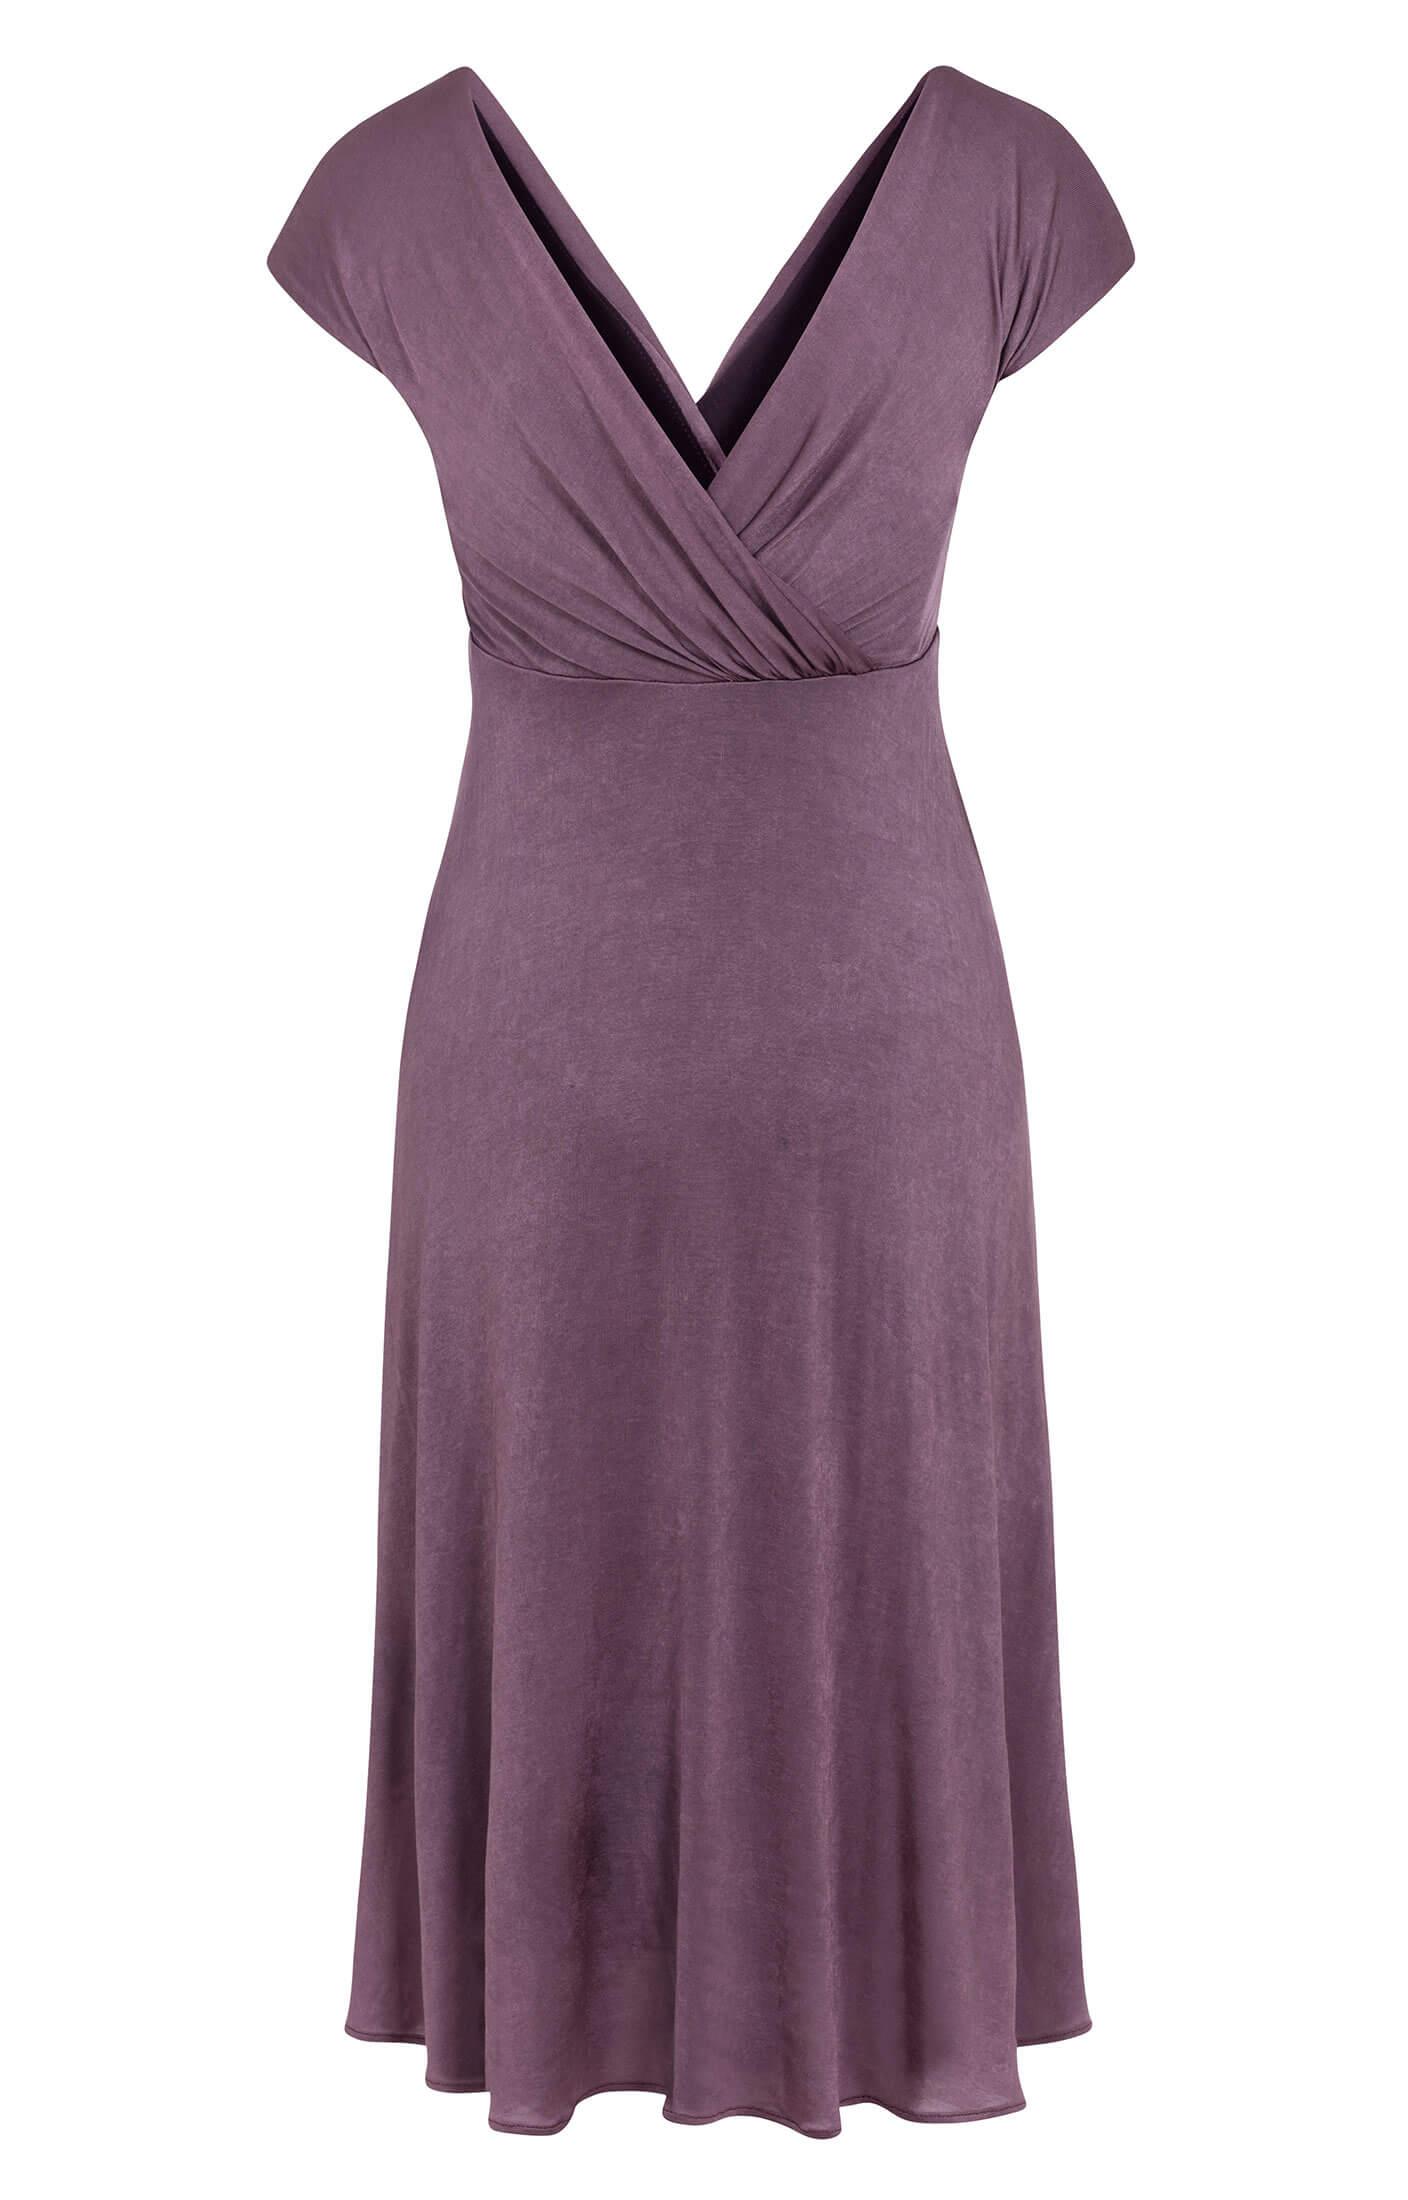 Alessandra Maternity Dress Short Heather - Maternity Wedding Dresses ...